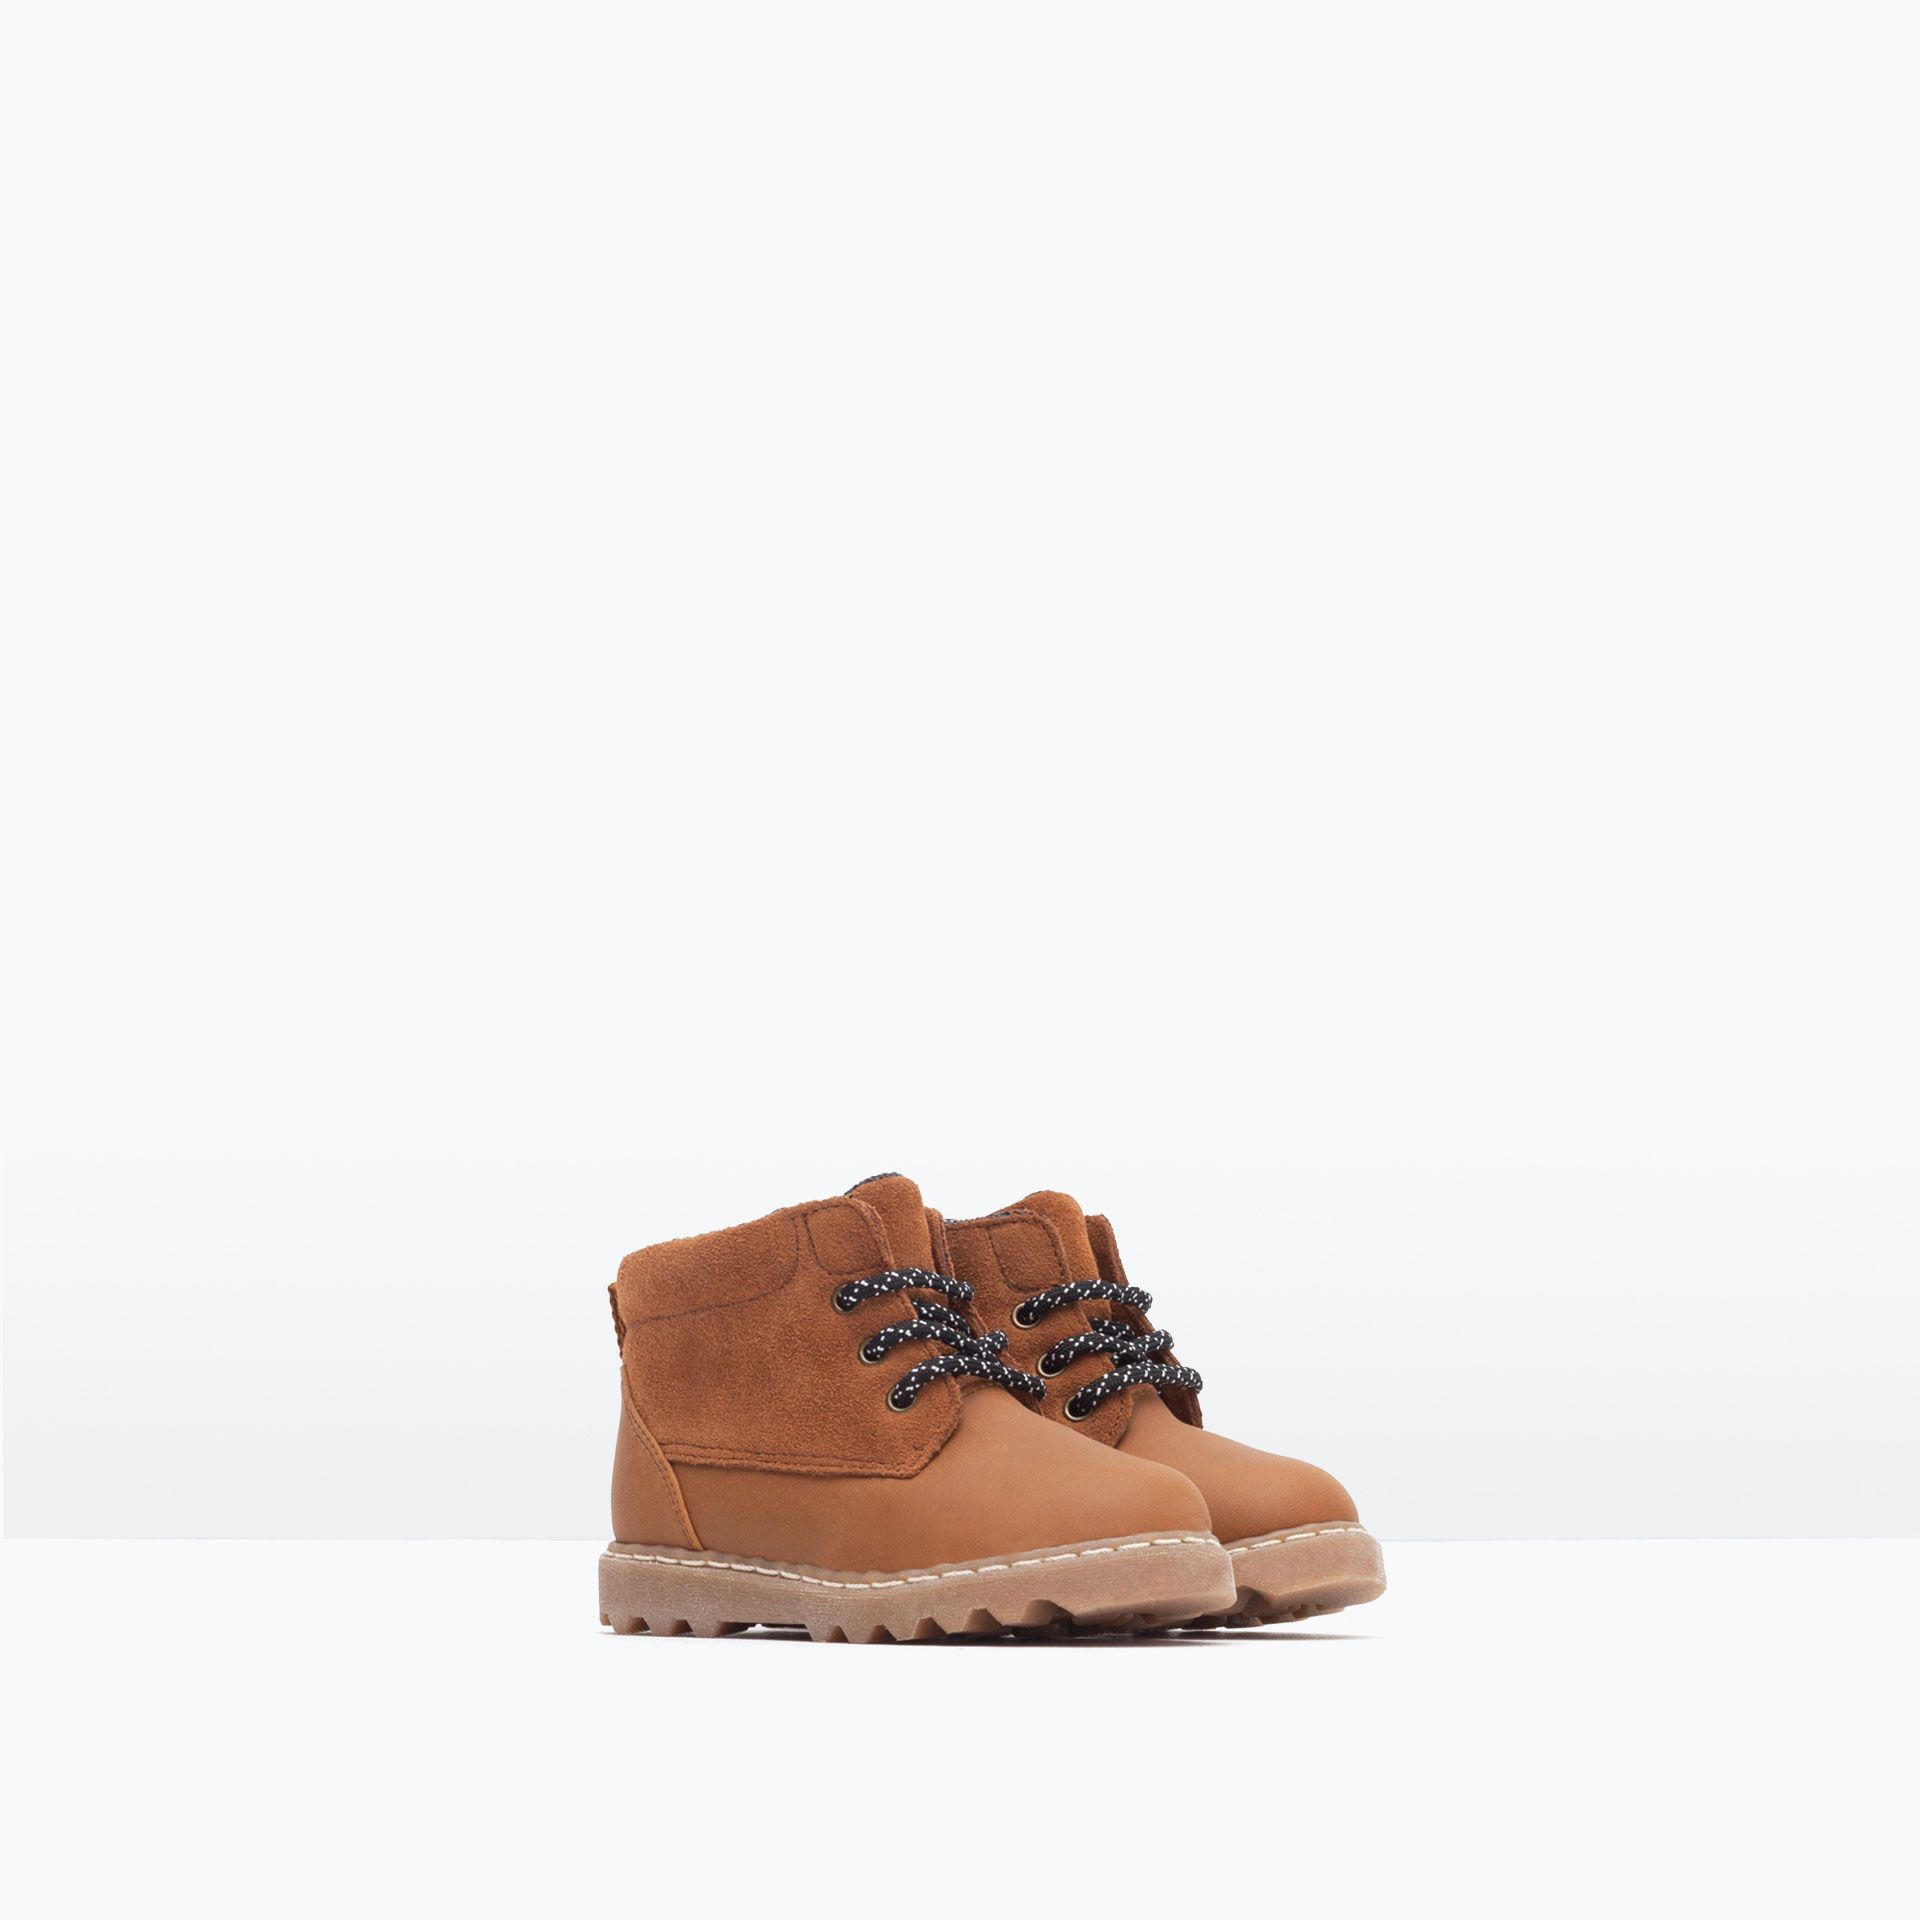 Modne Skorzane Botki Buty Niemowle Chlopiec 3 Miesiace 3 Lata Dzieci Boots Leather Fashion Boots Boy Shoes